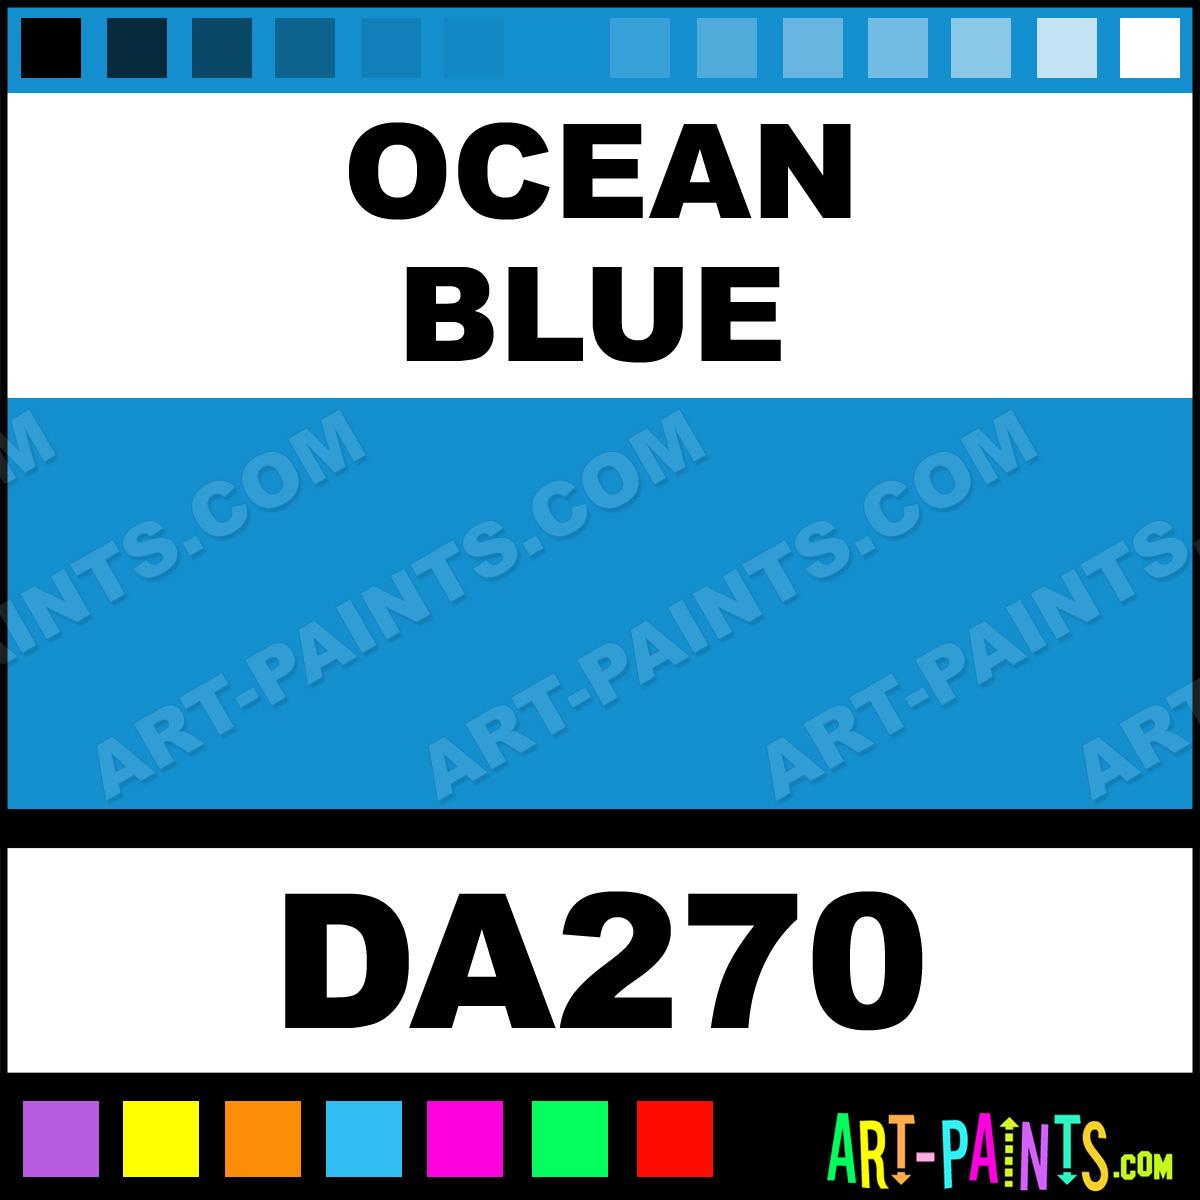 lge blue ocean 1 (lollipop) phone (opal blue)  product des here we are going to use a   lg v10 dual-sim h961n (unlocked, 64gb, ocean blue) flash, and camera.